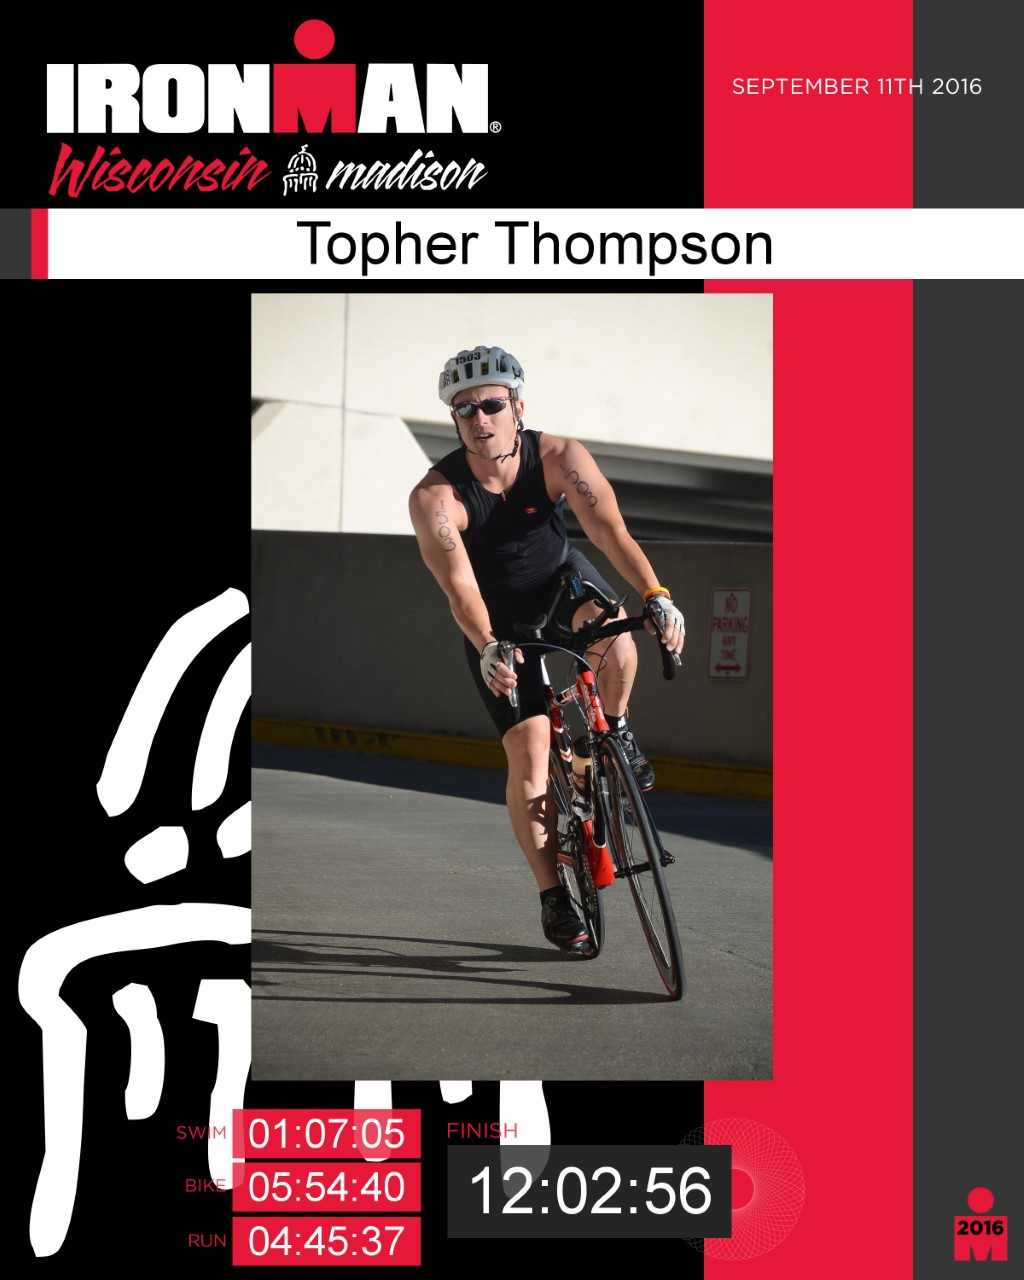 Topher Thompson